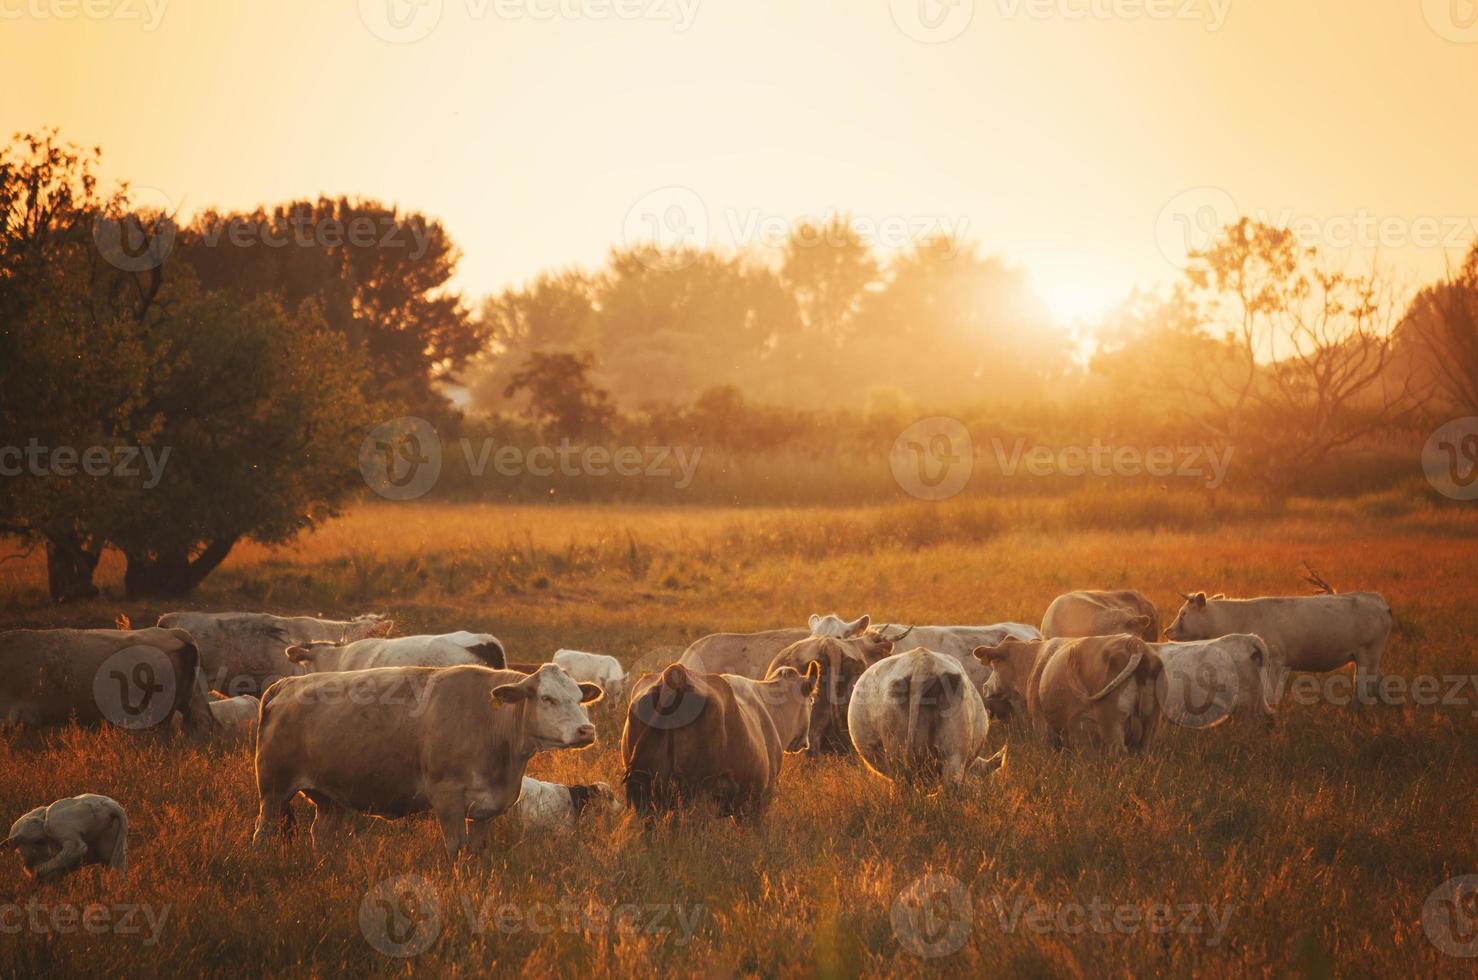 koeien op de weide foto